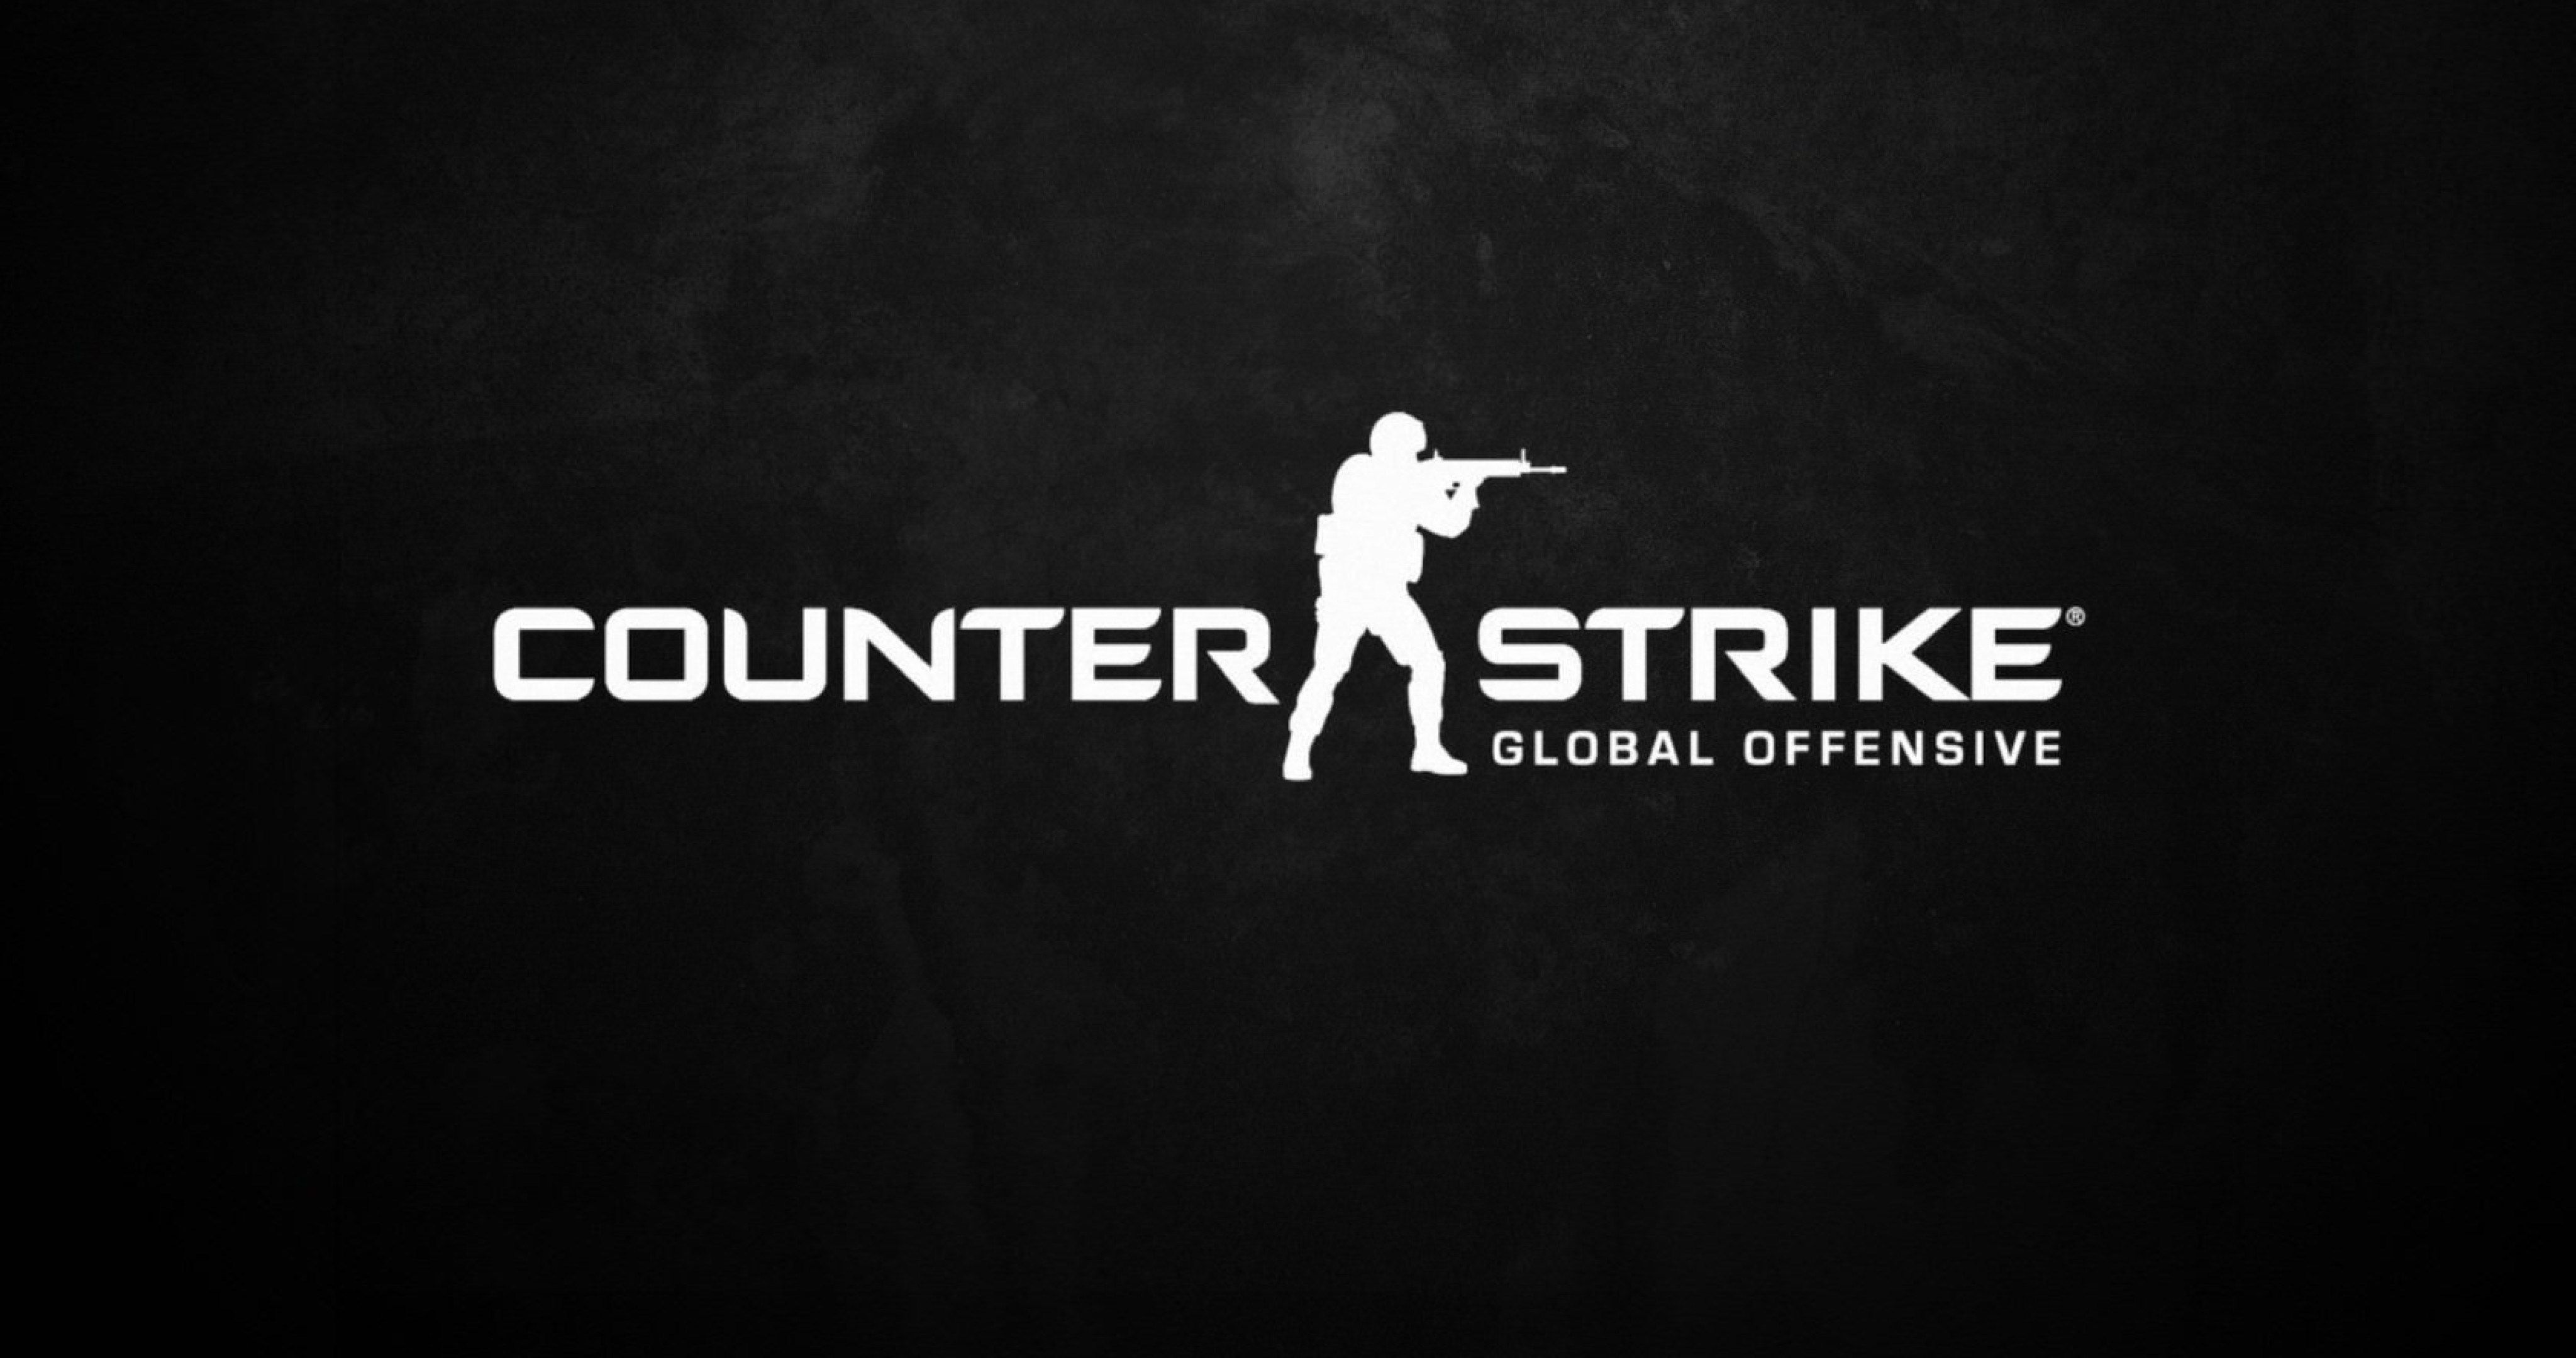 Counter Strike 4k Ultra Hd Wallpaper Offensive Strike Counter Logic Gaming